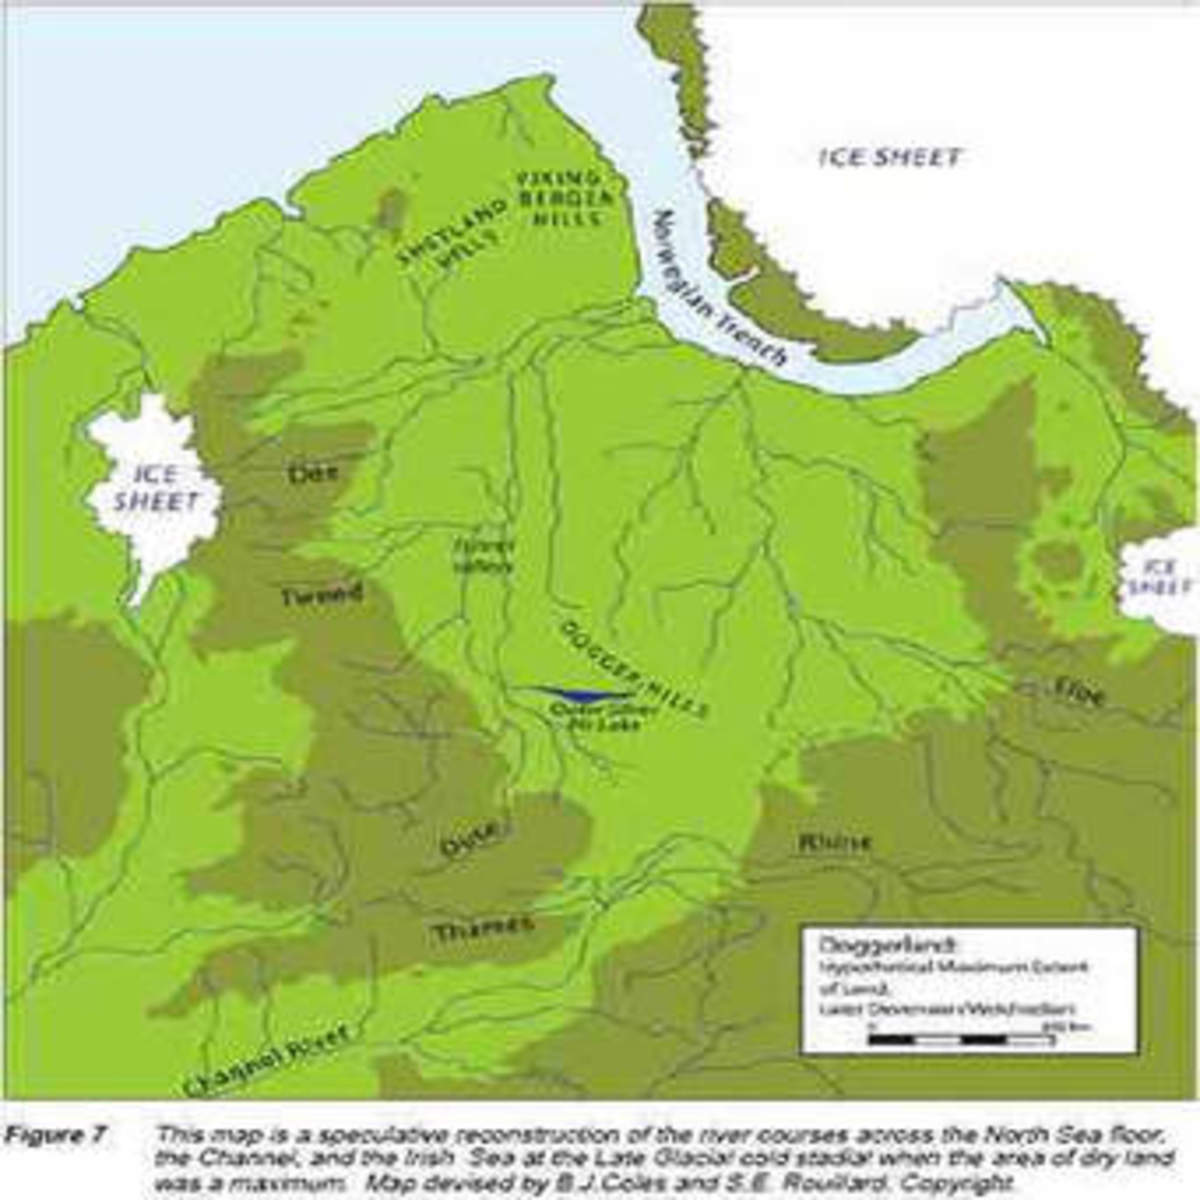 Original extent of Doggerland